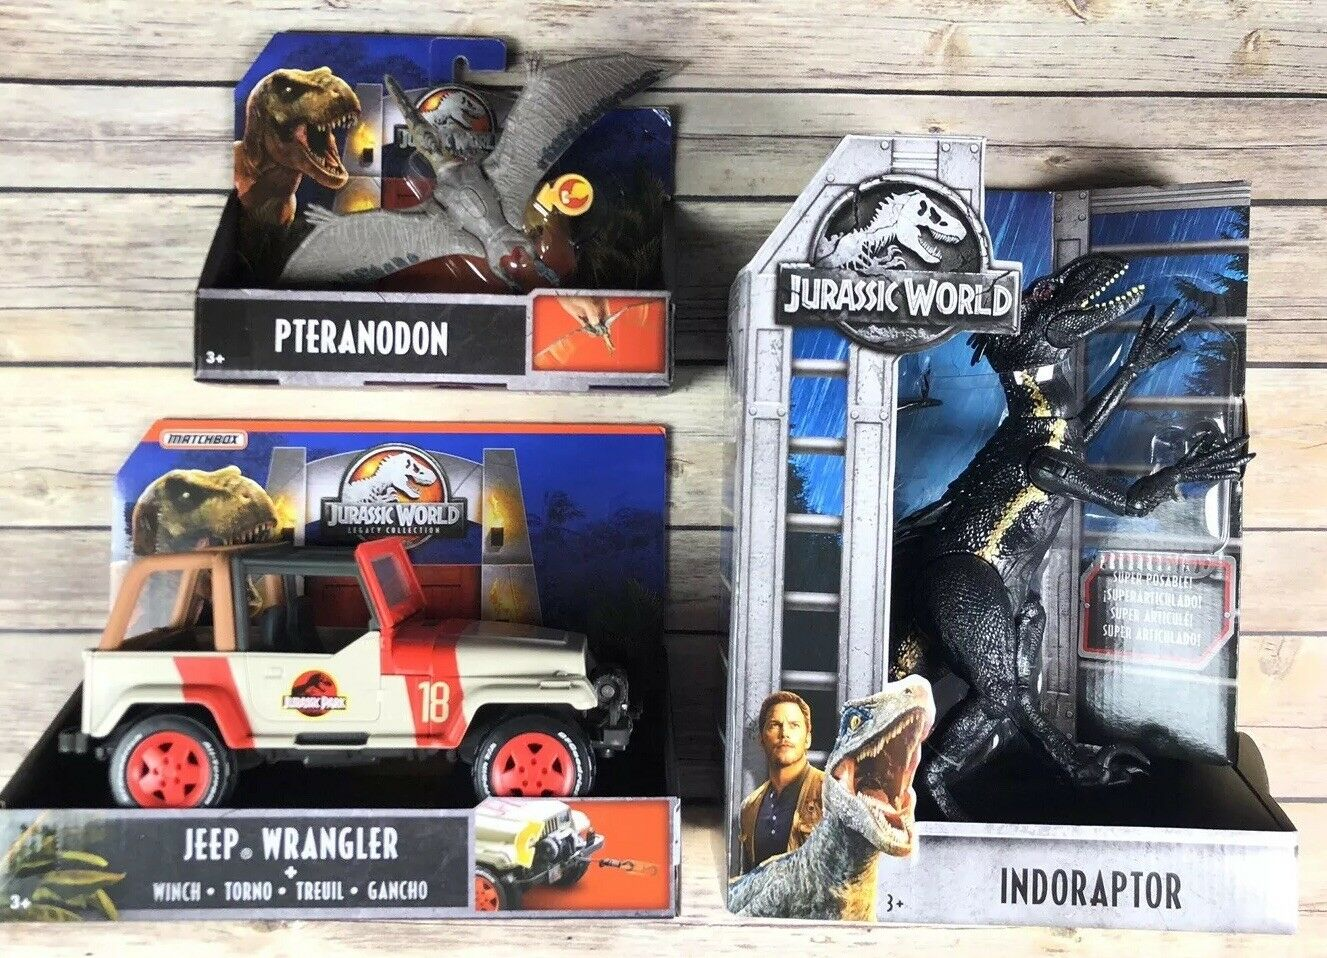 world dinosaurier menge 3 vermächtnis jeep wrangler indoraptor pteranodon